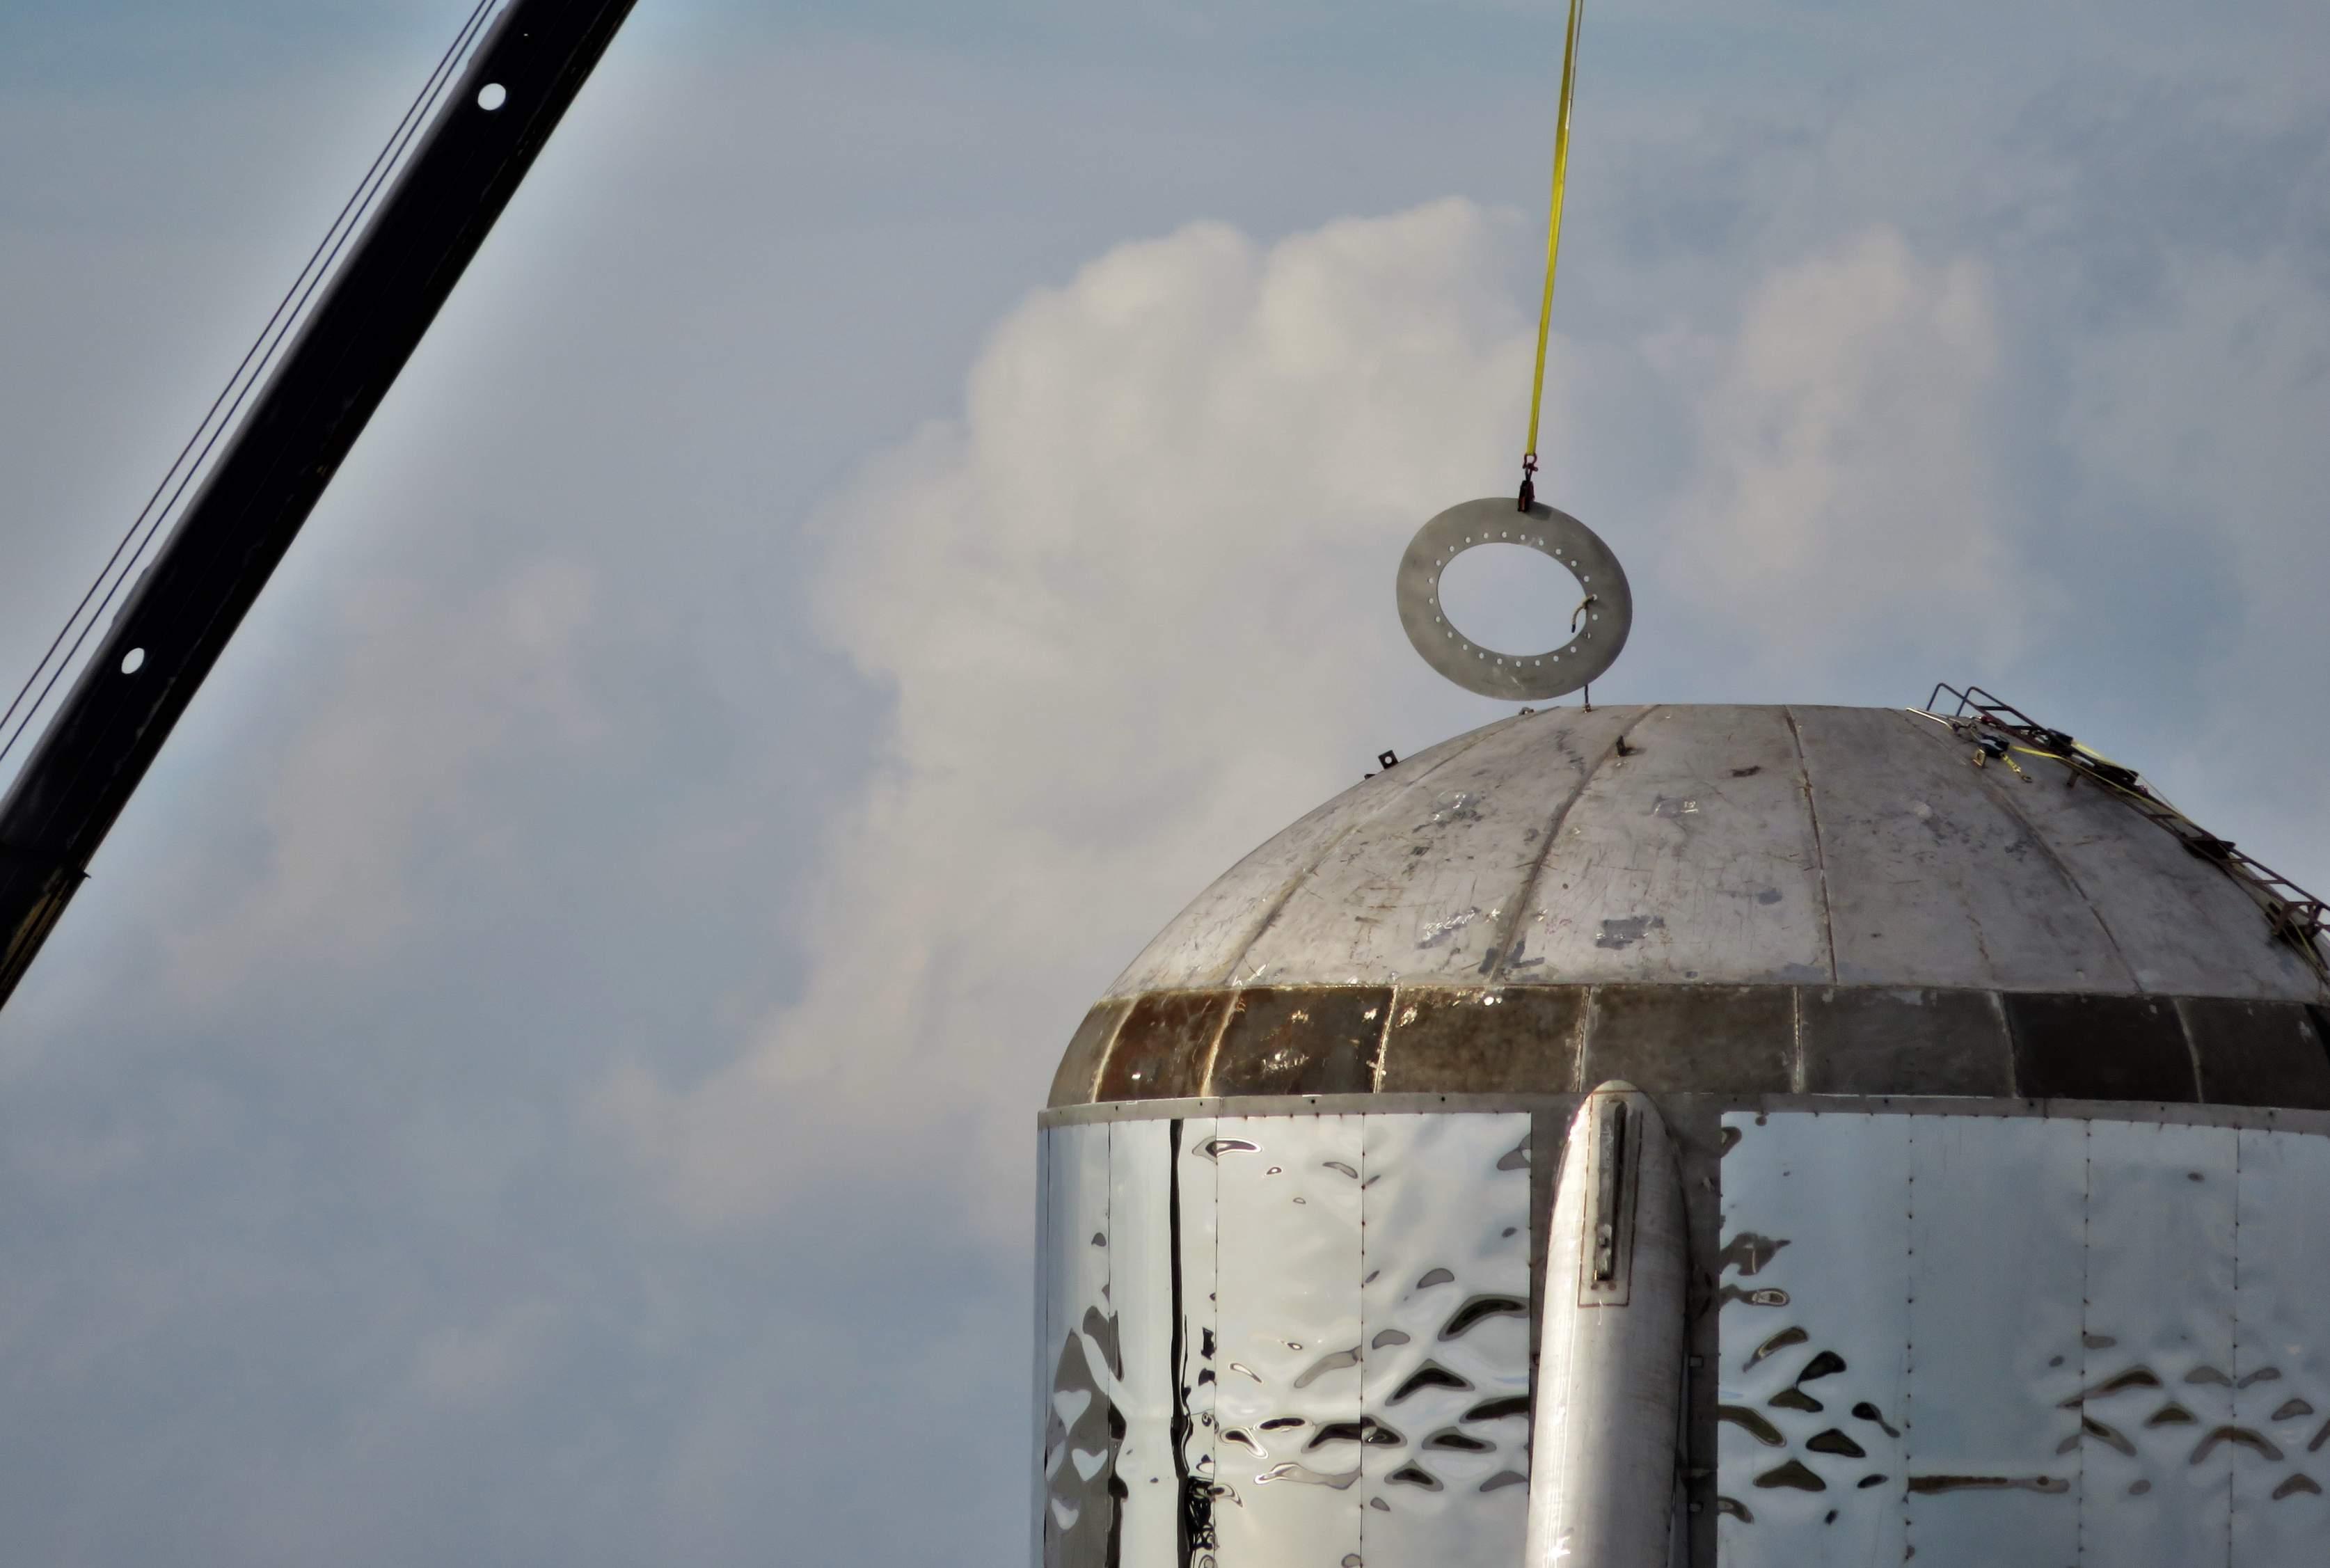 Boca Chica Starship dome work 012519 (NASASpaceflight – bocachicagal) 1 (c)